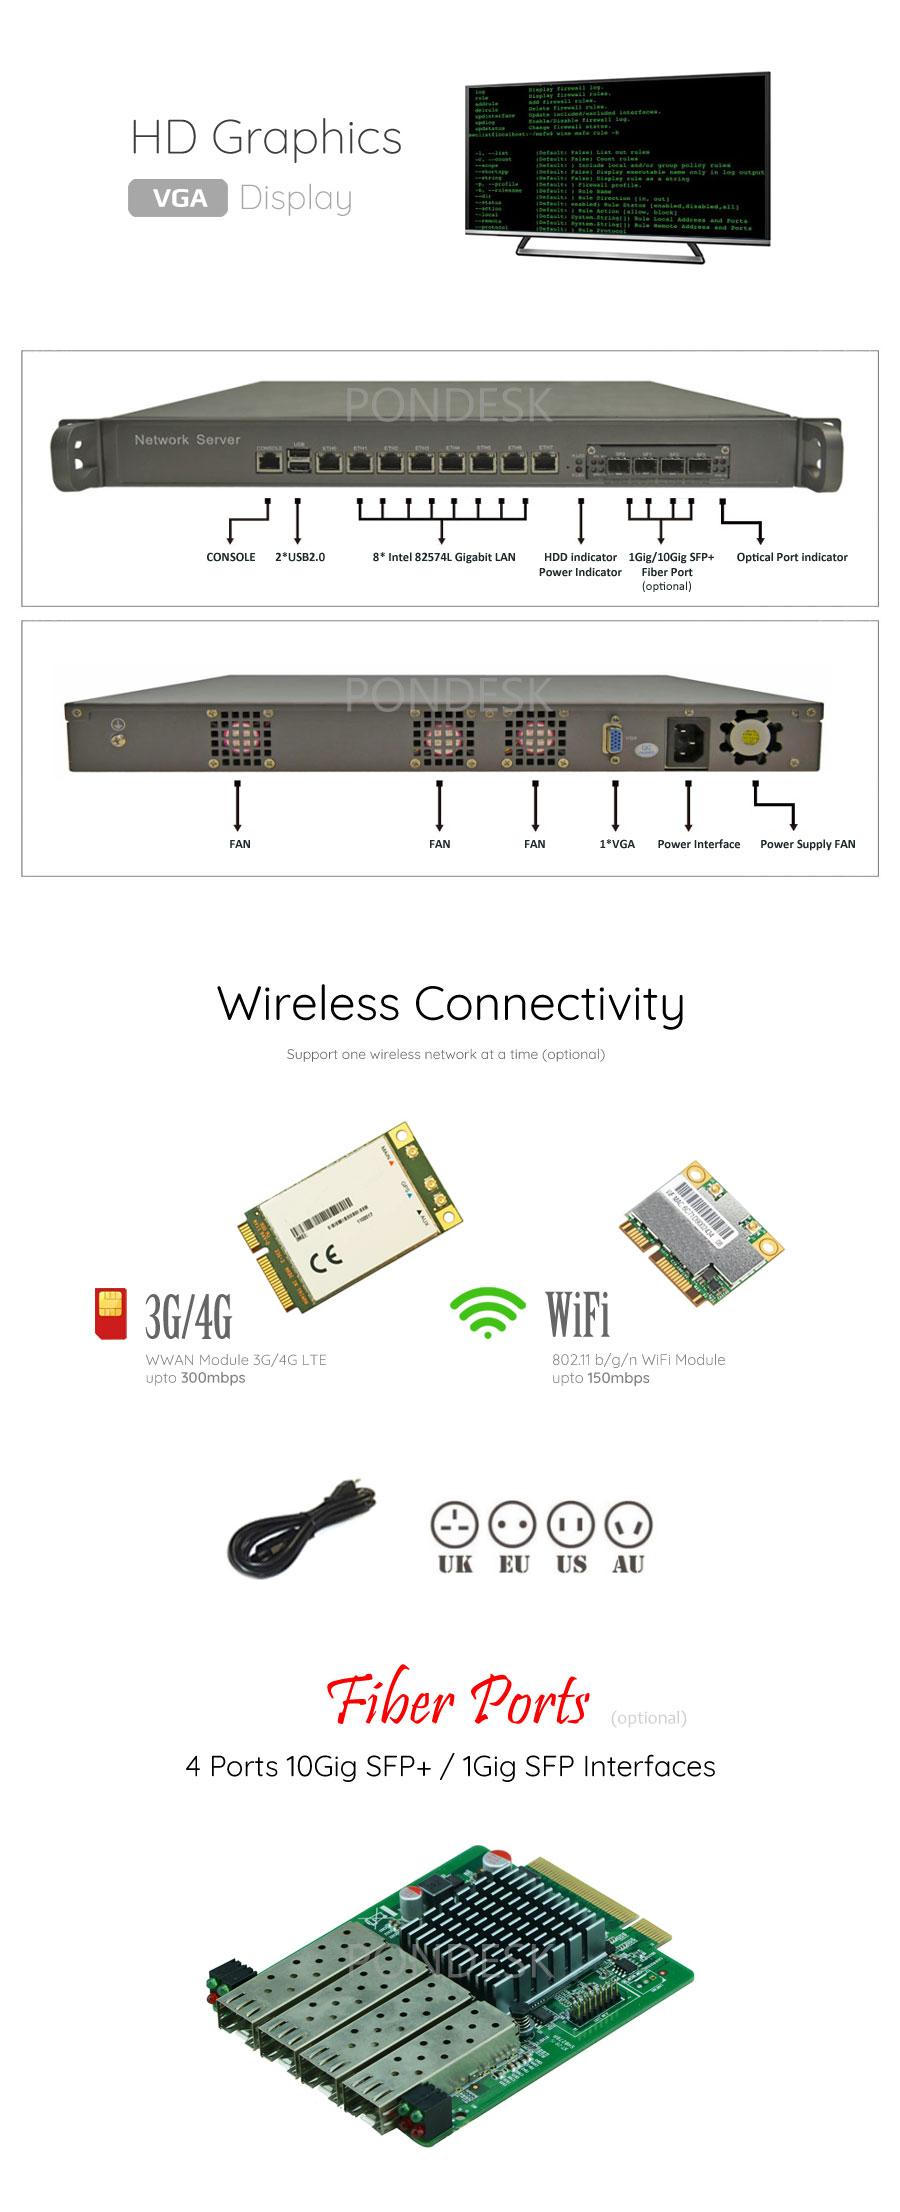 8 LAN 1 COM 4 Fiber SFP 4G NGFW Firewall 1U Rackmount Server - NSHO-001 | Image